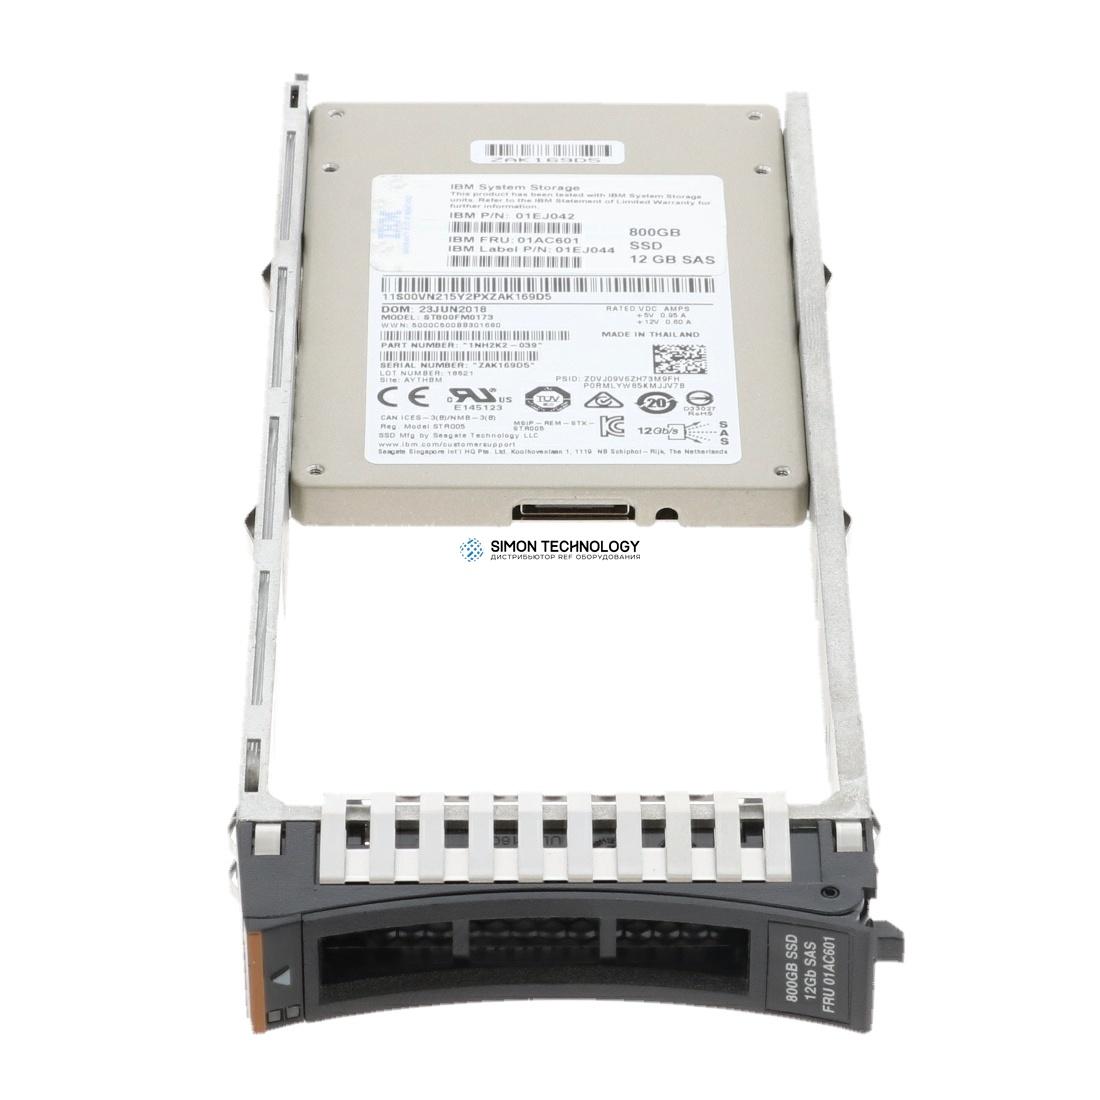 SSD IBM 800GB 2.5 INCH FLASH DRIVE (2078AC9D)